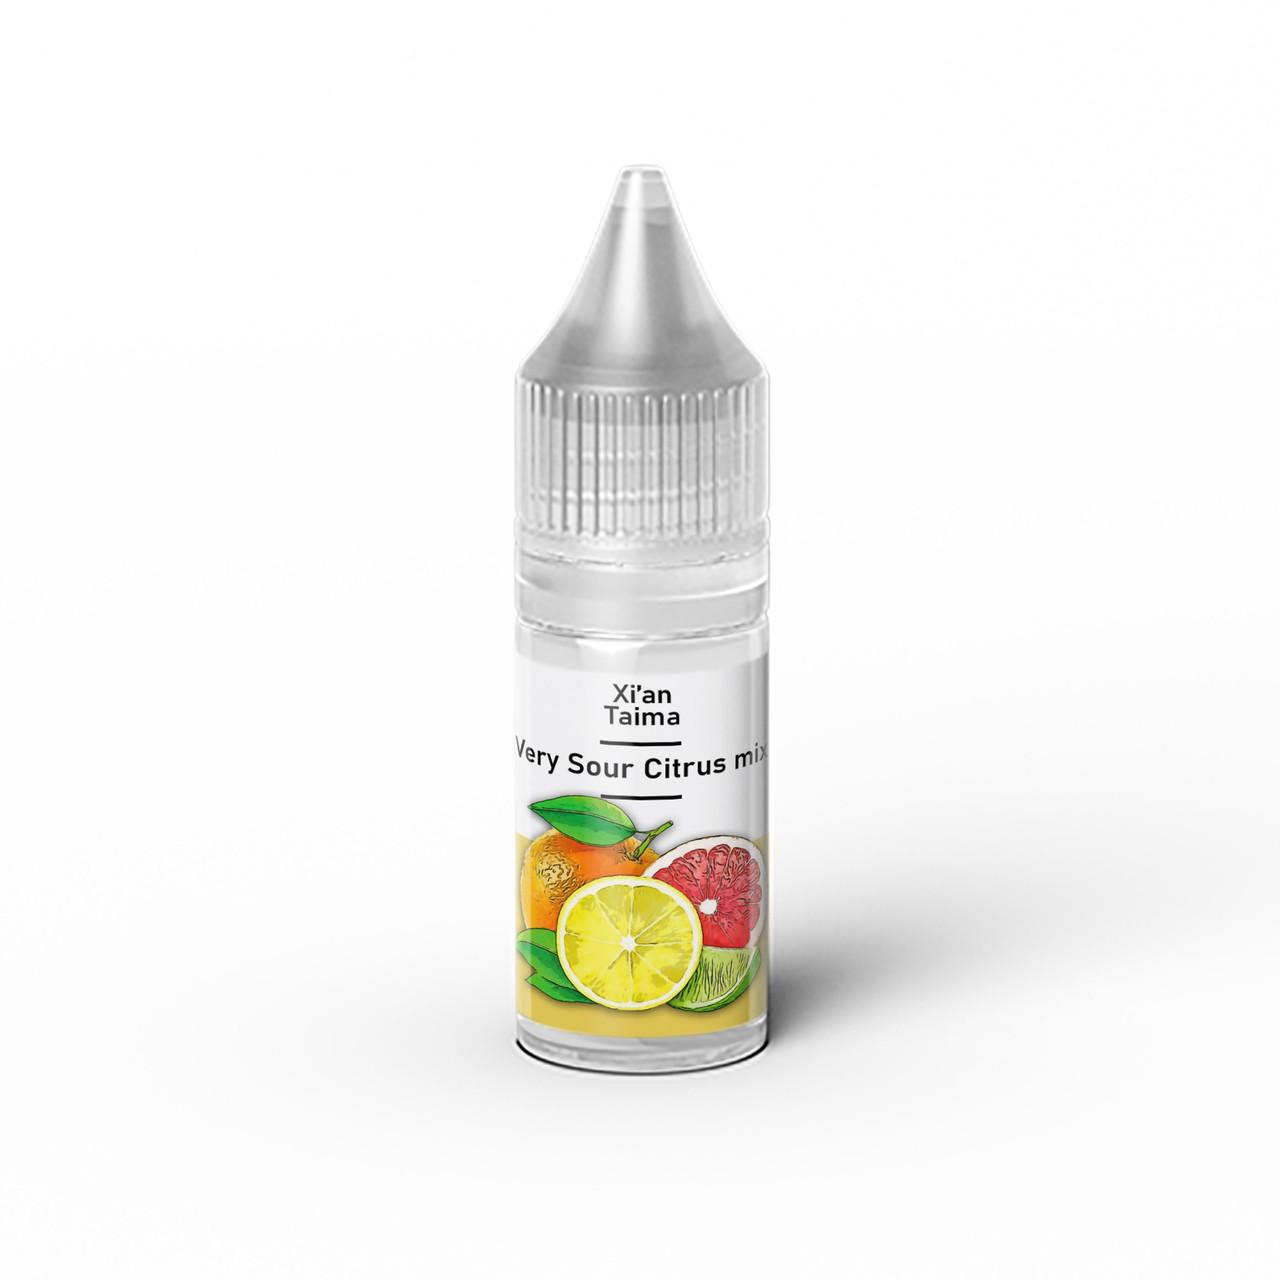 Ароматизатор Xian Very sour citrus mix (Микс цитрусов)